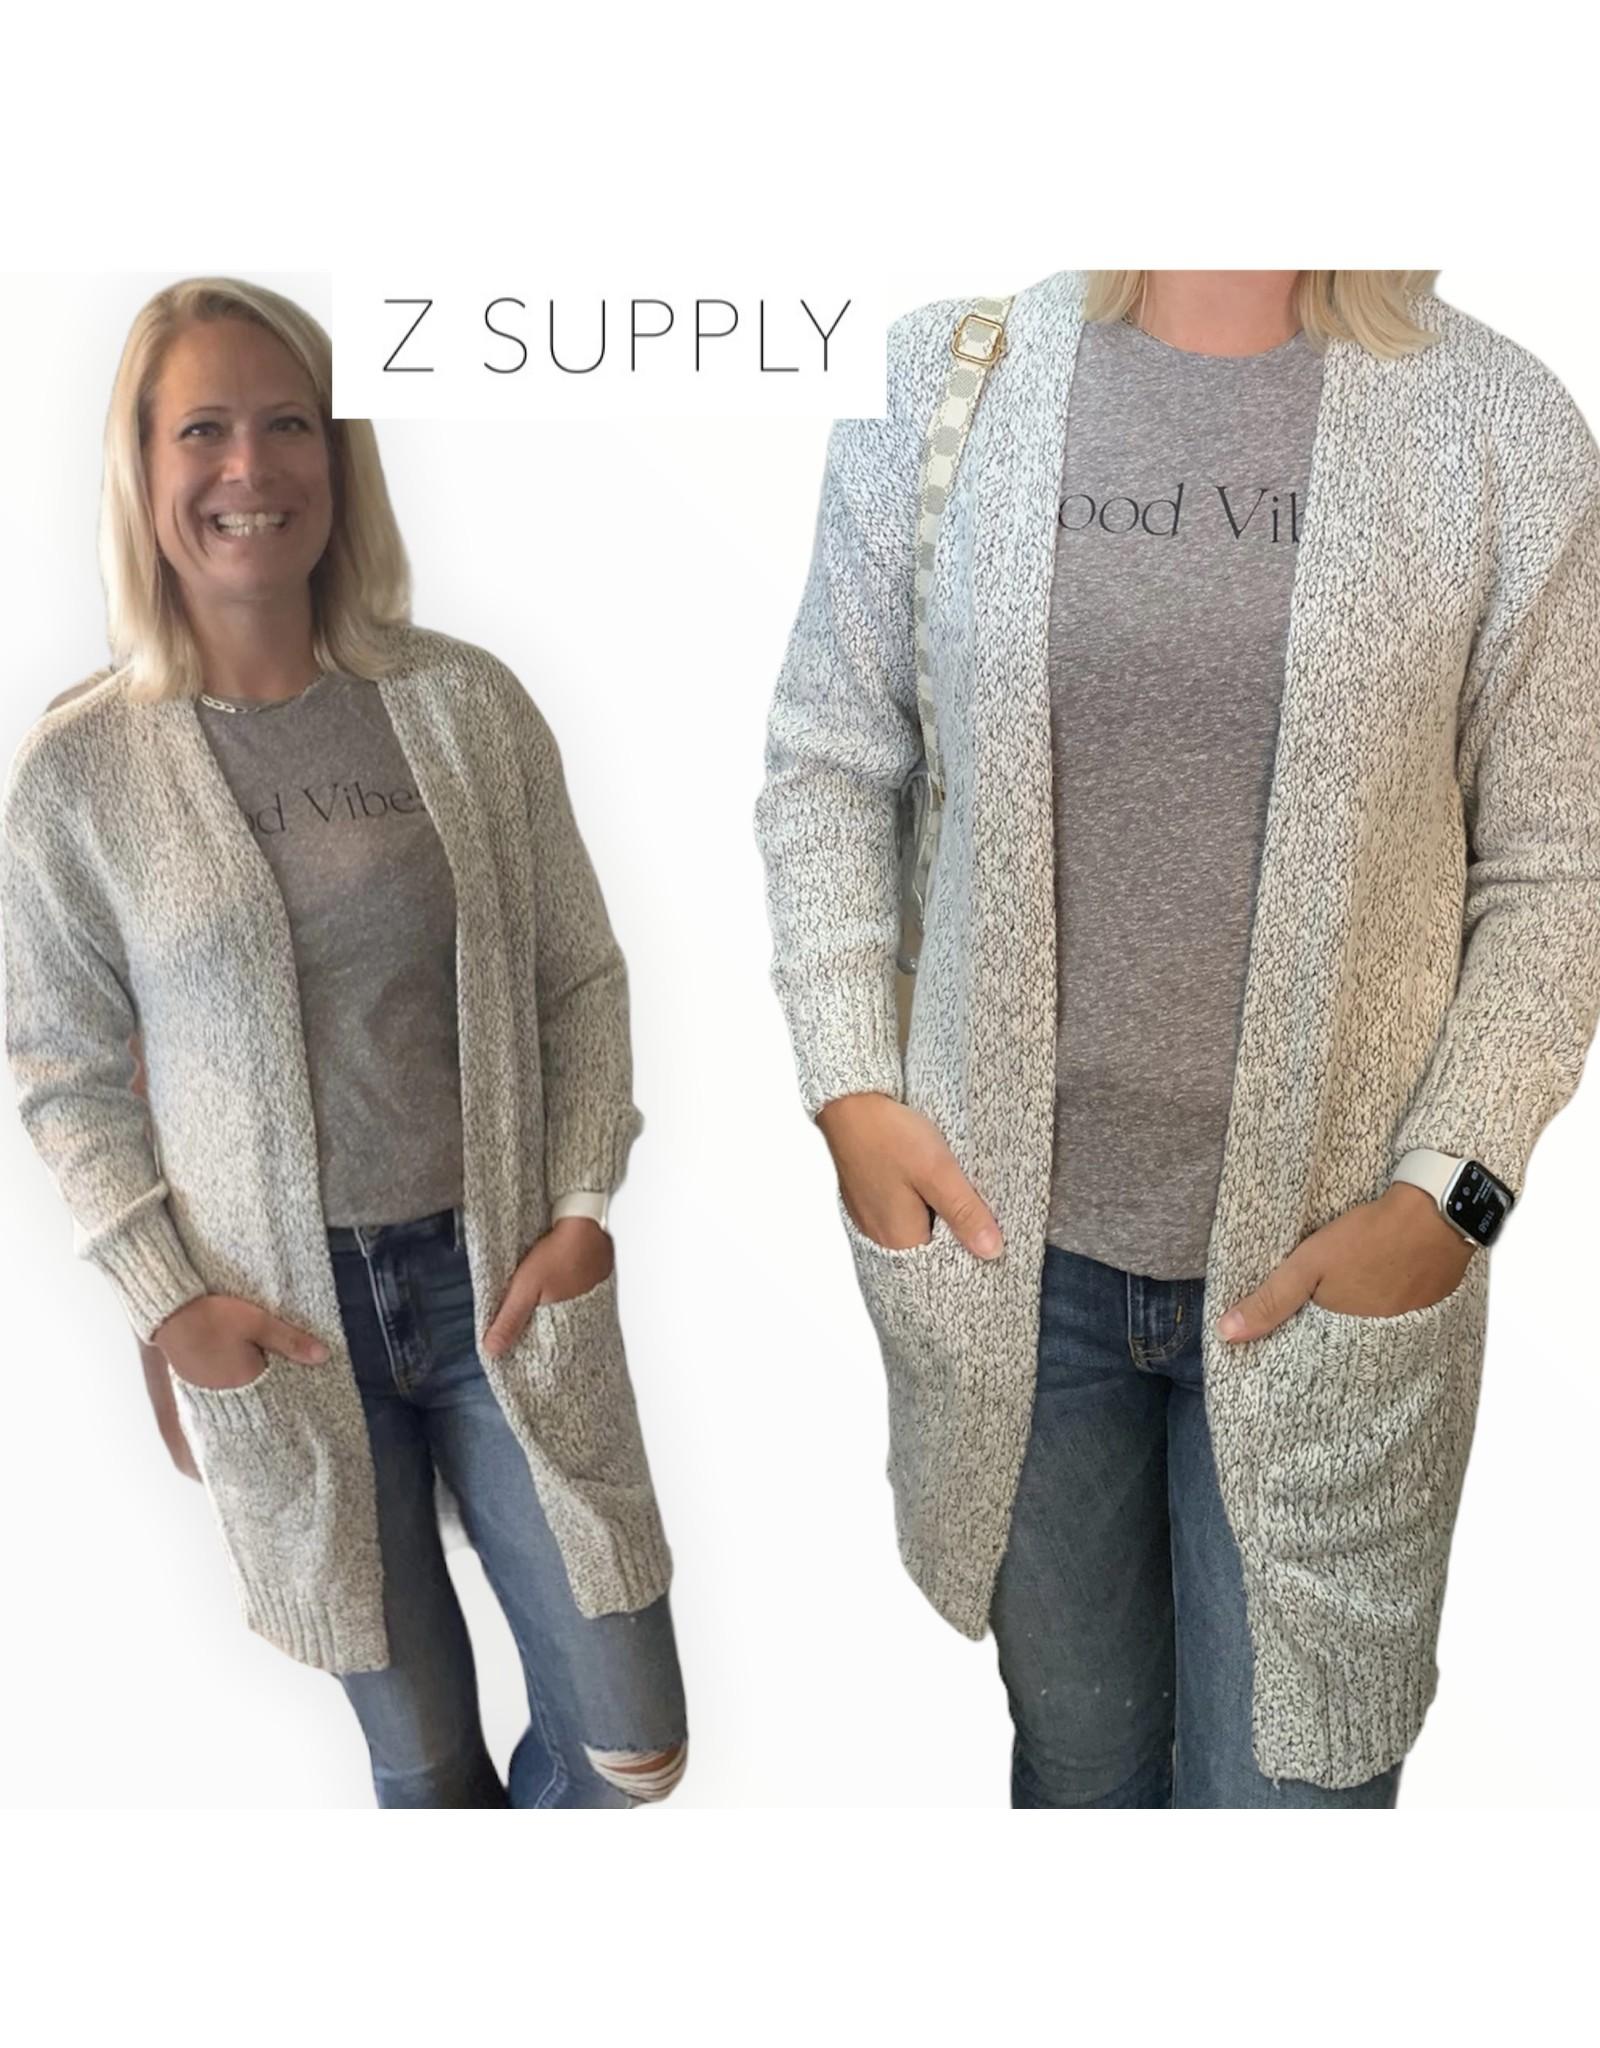 Z Supply Z SUPPLY Paige Marled Cardigan